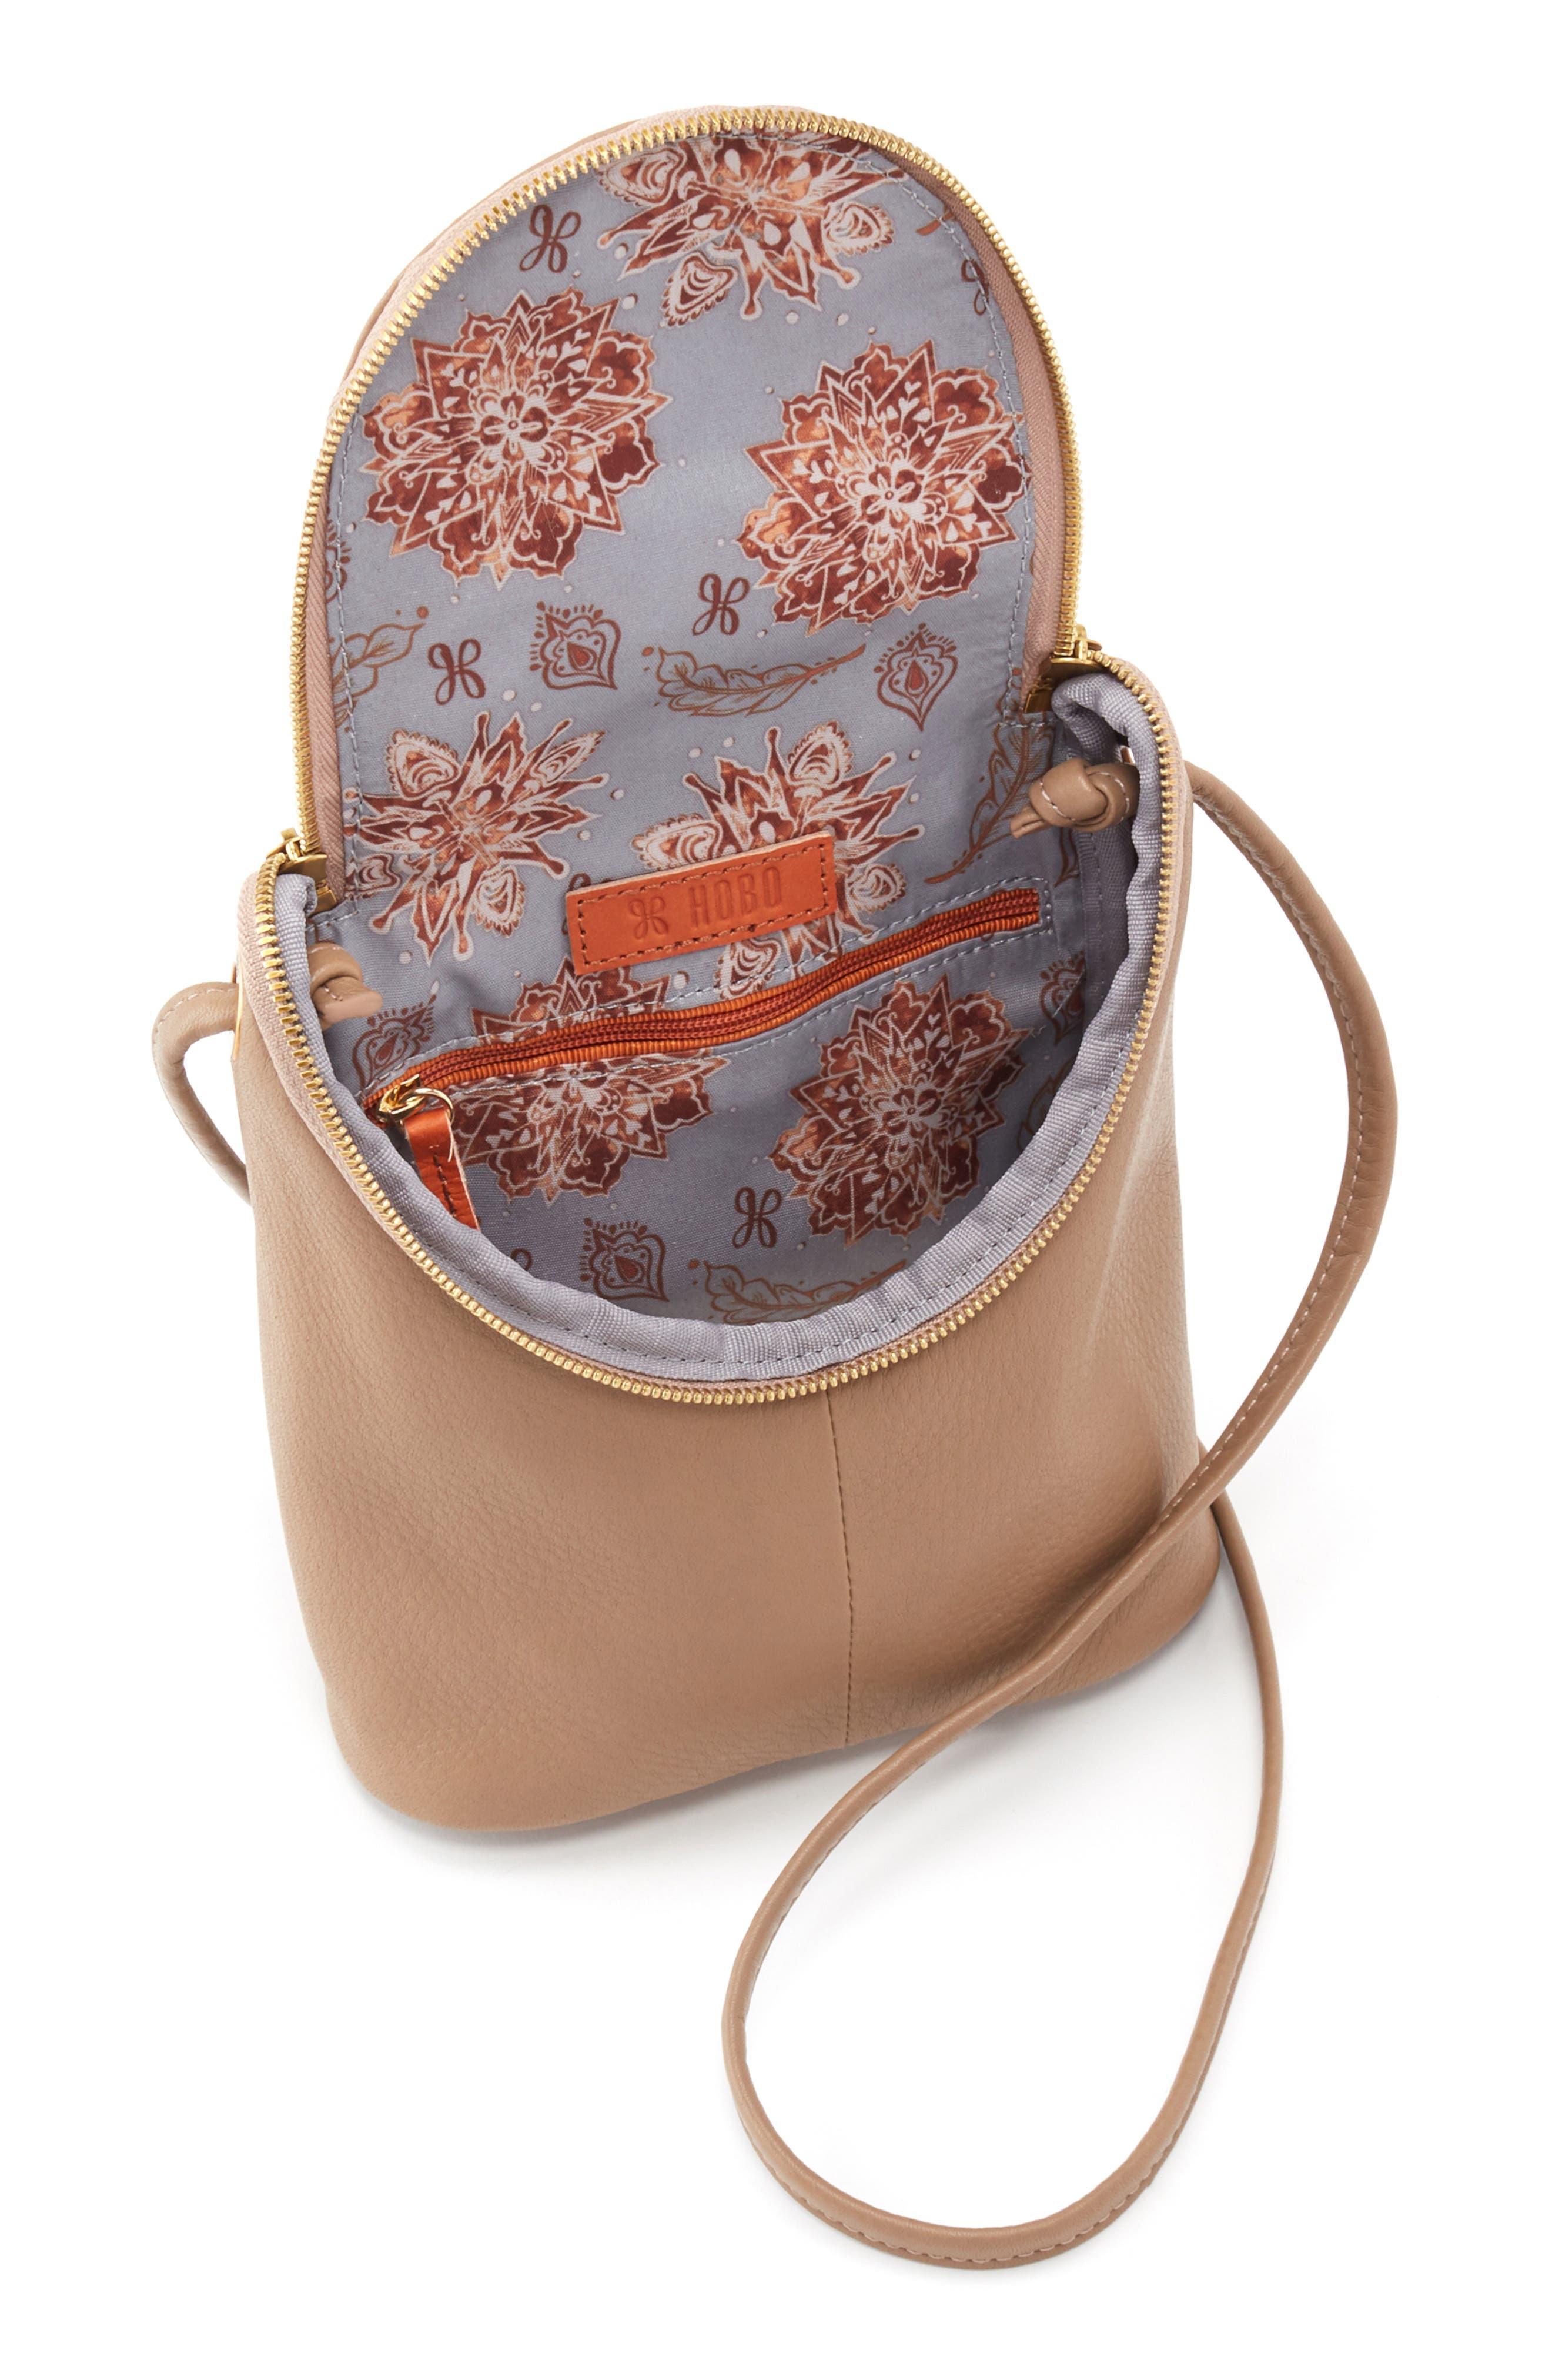 Fern Saddle Bag,                             Alternate thumbnail 3, color,                             020